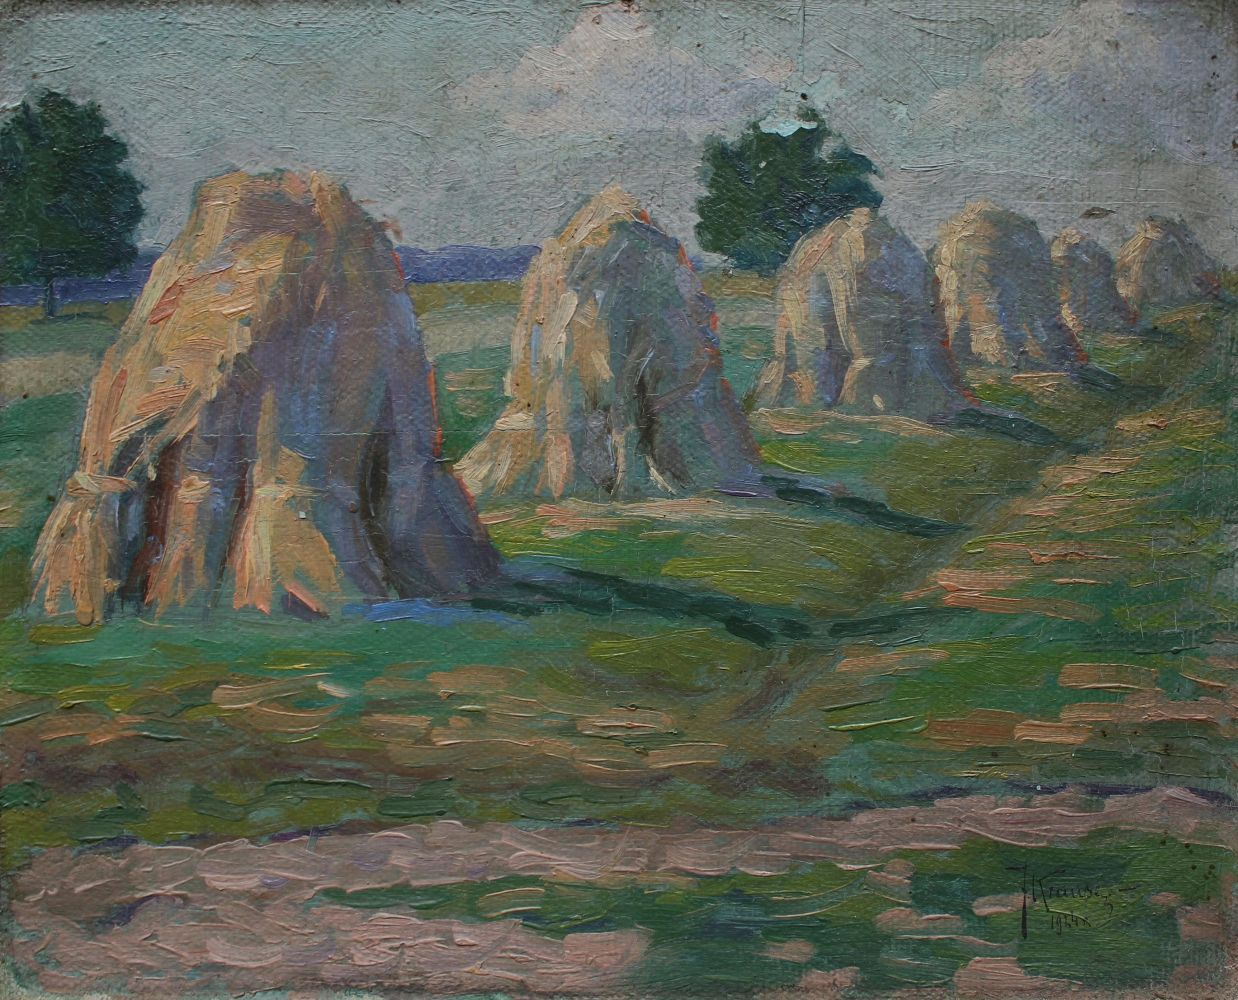 Pejzaż ze snopami (1924)